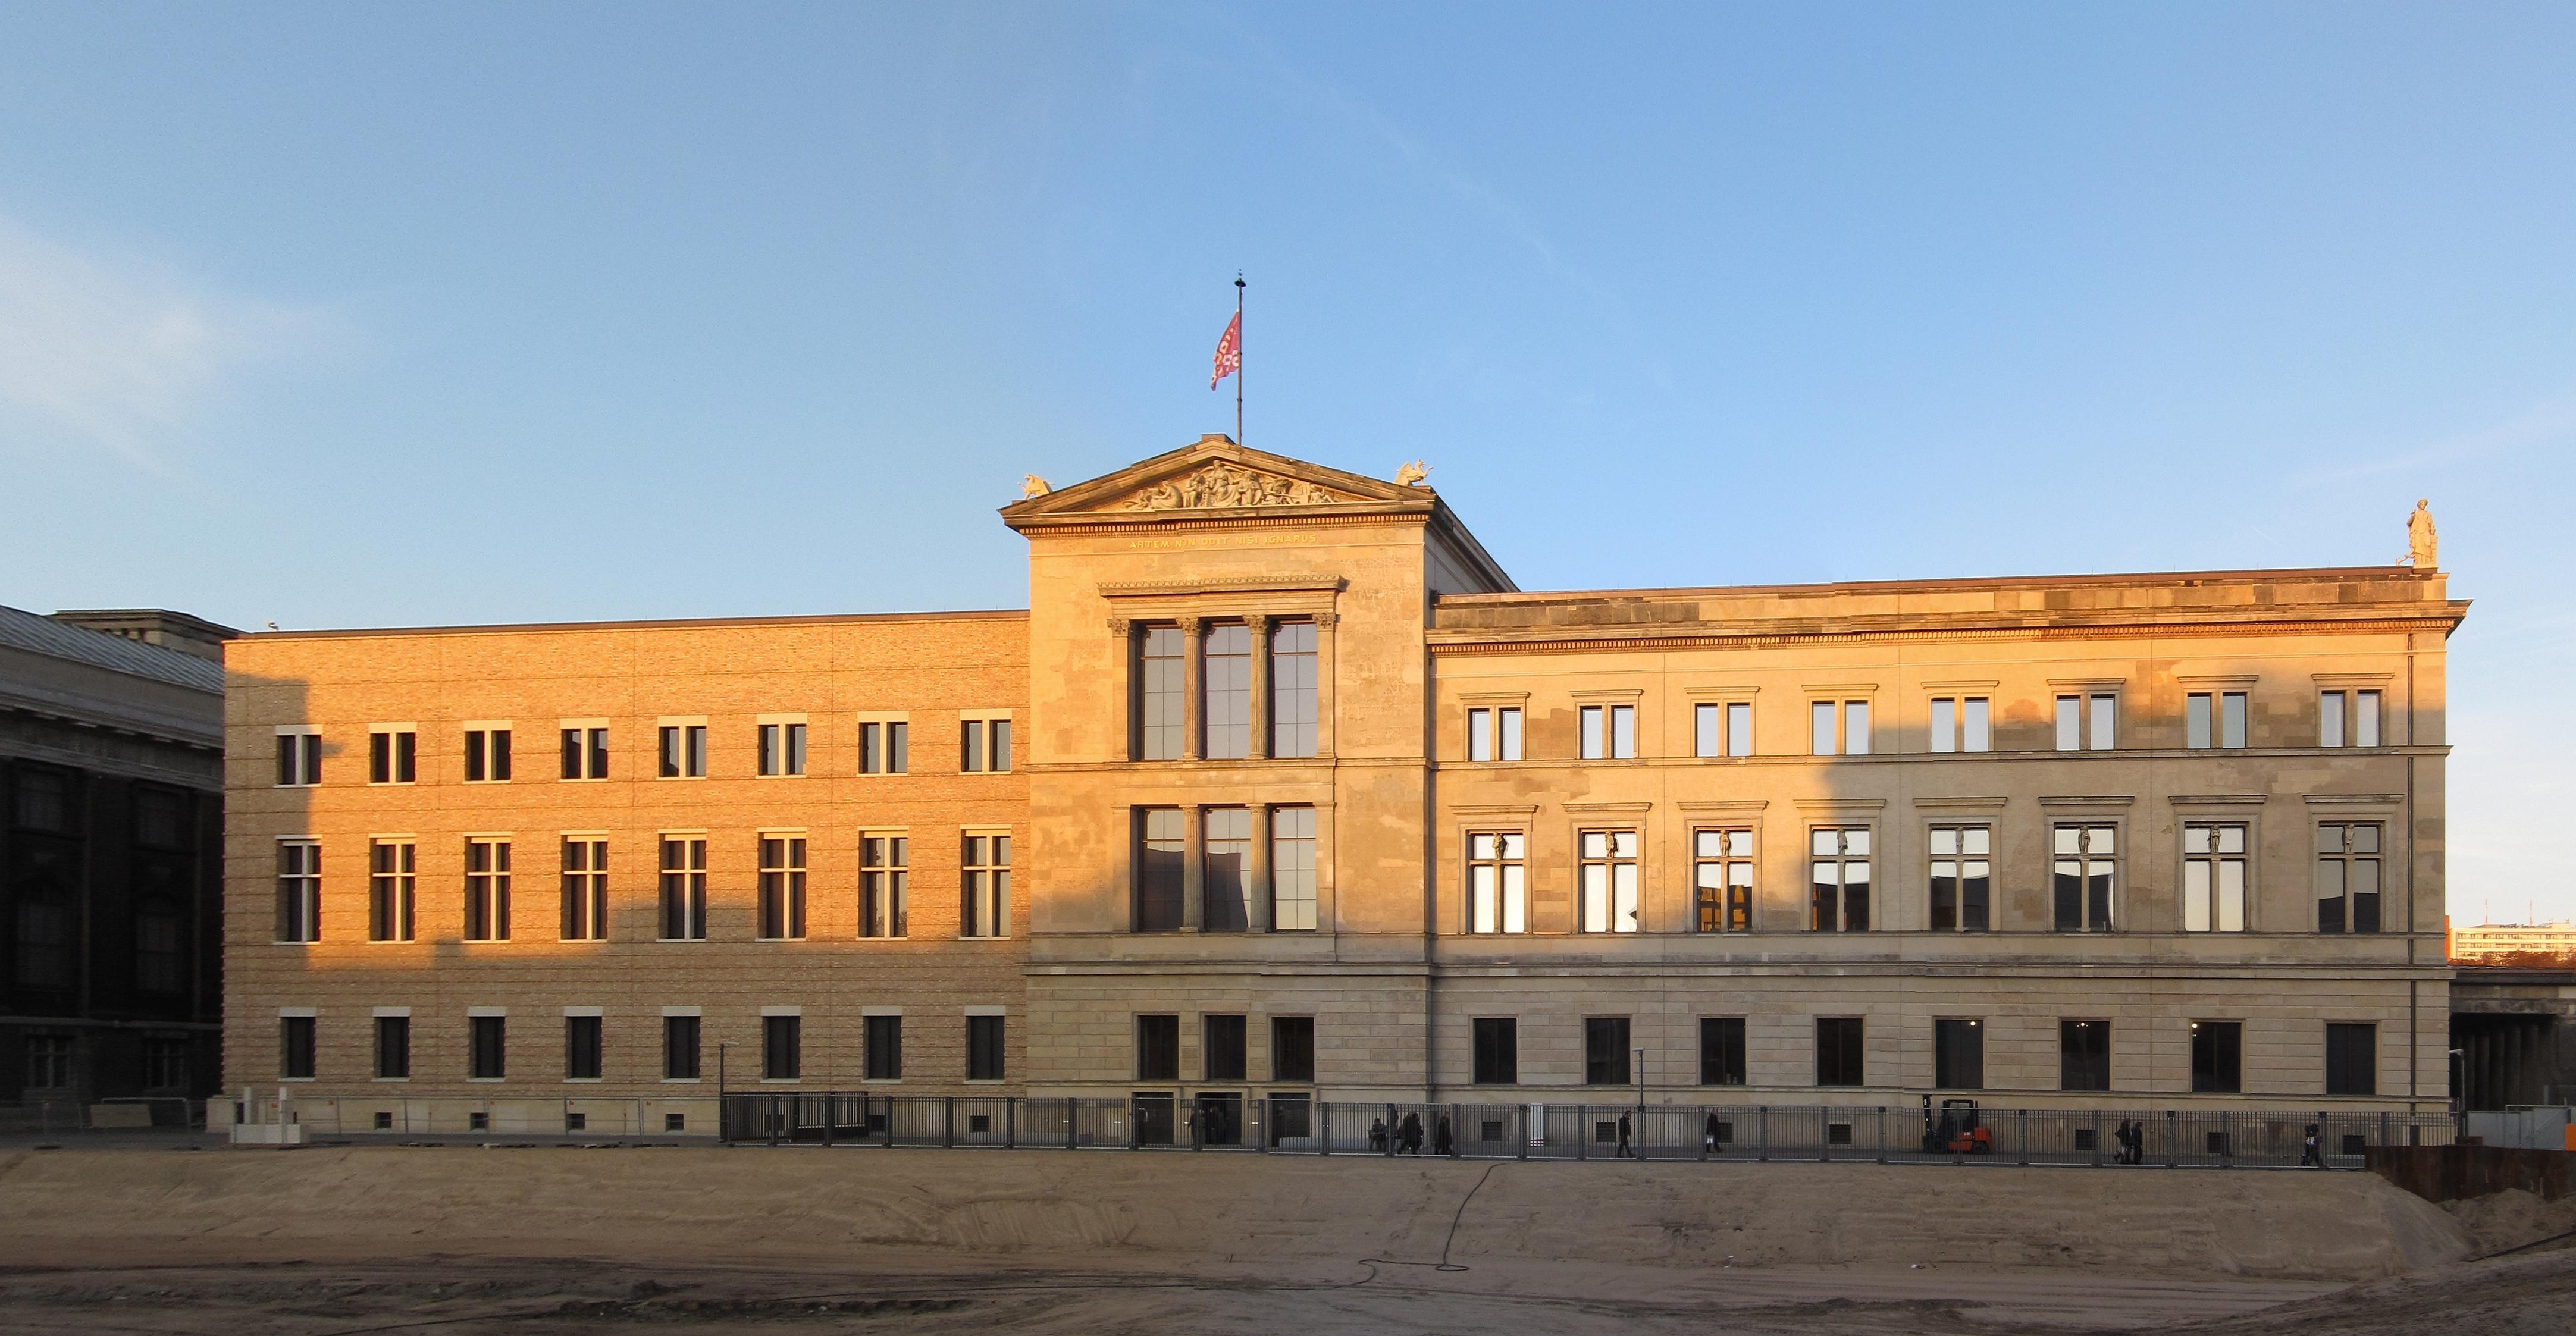 [url=https://flic.kr/p/25WCDRS][img]https://farm1.staticflickr.com/887/41312361792_273b1139a8_o.jpg[/img][/url][url=https://flic.kr/p/25WCDRS]Neues_Museum_Berlin_EP1[/url] by [url=https://www.flickr.com/photos/am-jochim/]Mark Jochim[/url], on Flickr